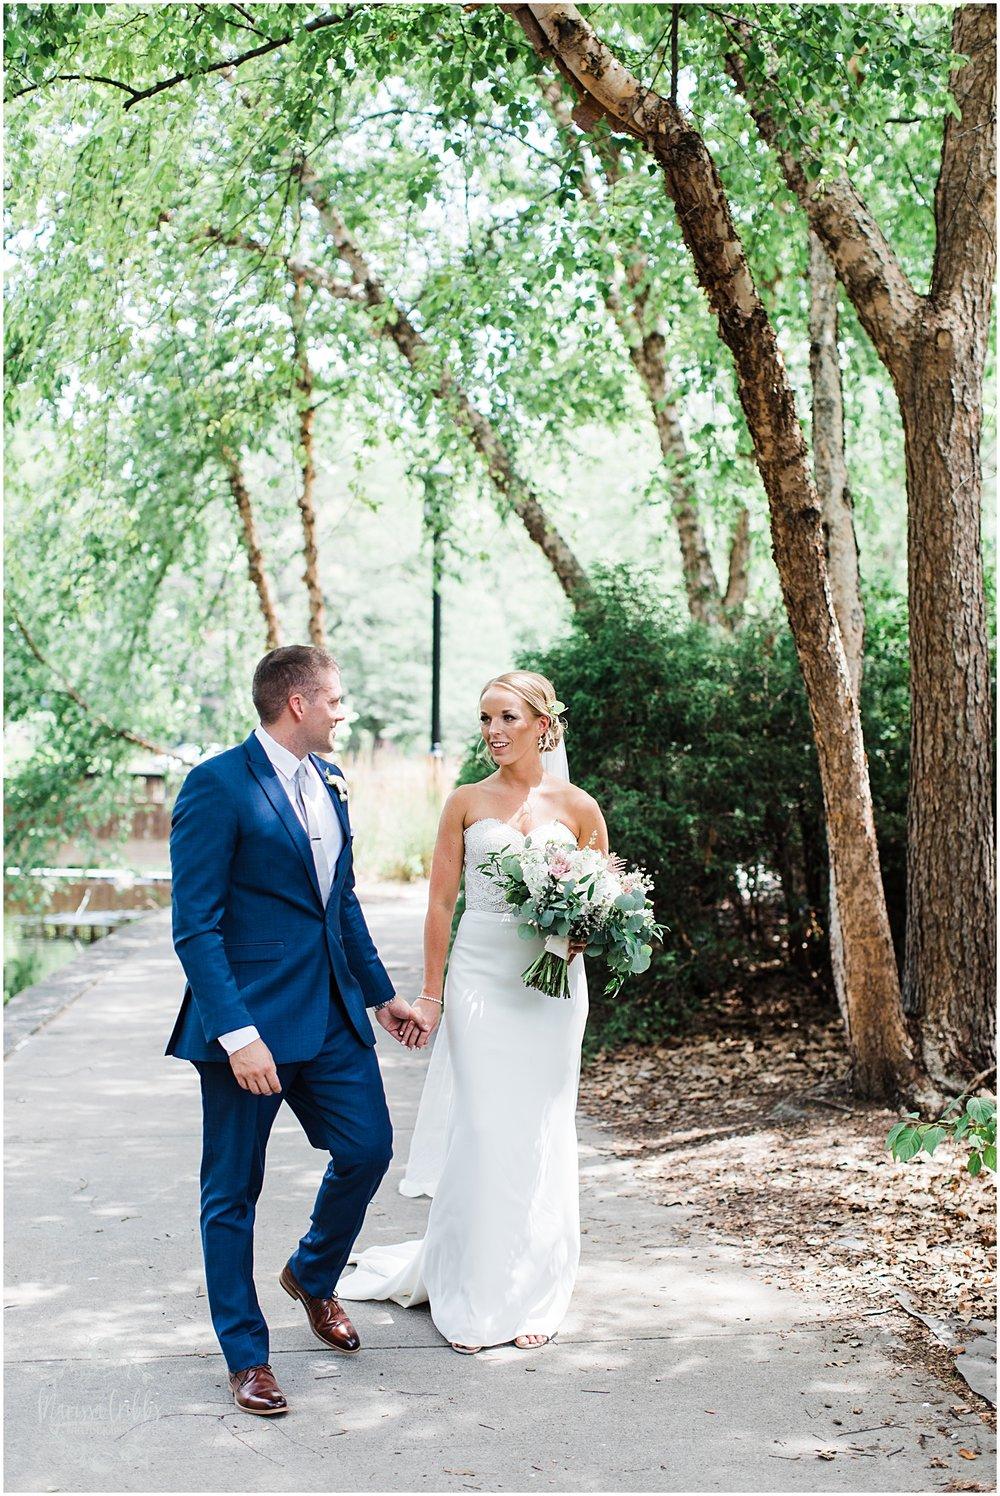 MAGNOLIA VENUE WEDDING | CHARLIE & NATALIE | MARISSA CRIBBS PHOTOGRAPHY_5718.jpg